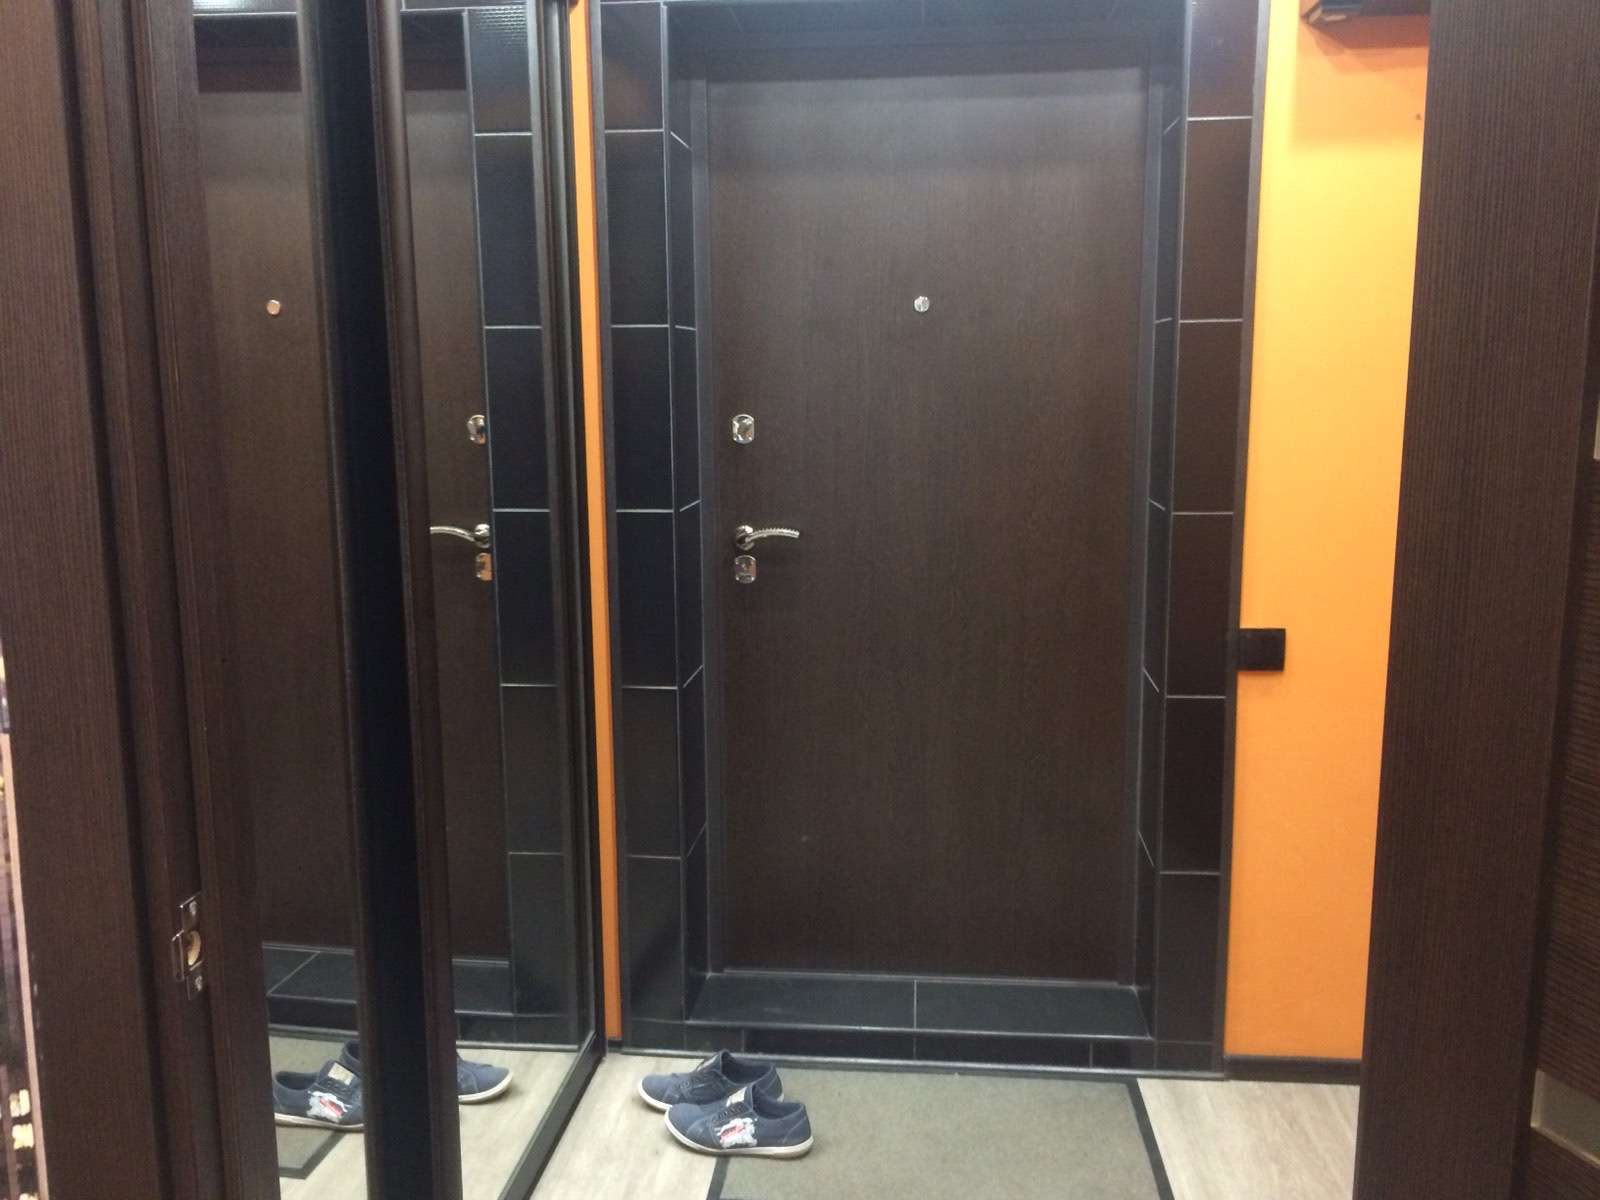 Аренда 1-комнатной квартиры, г. Тольятти, Юбилейная улица  дом 29